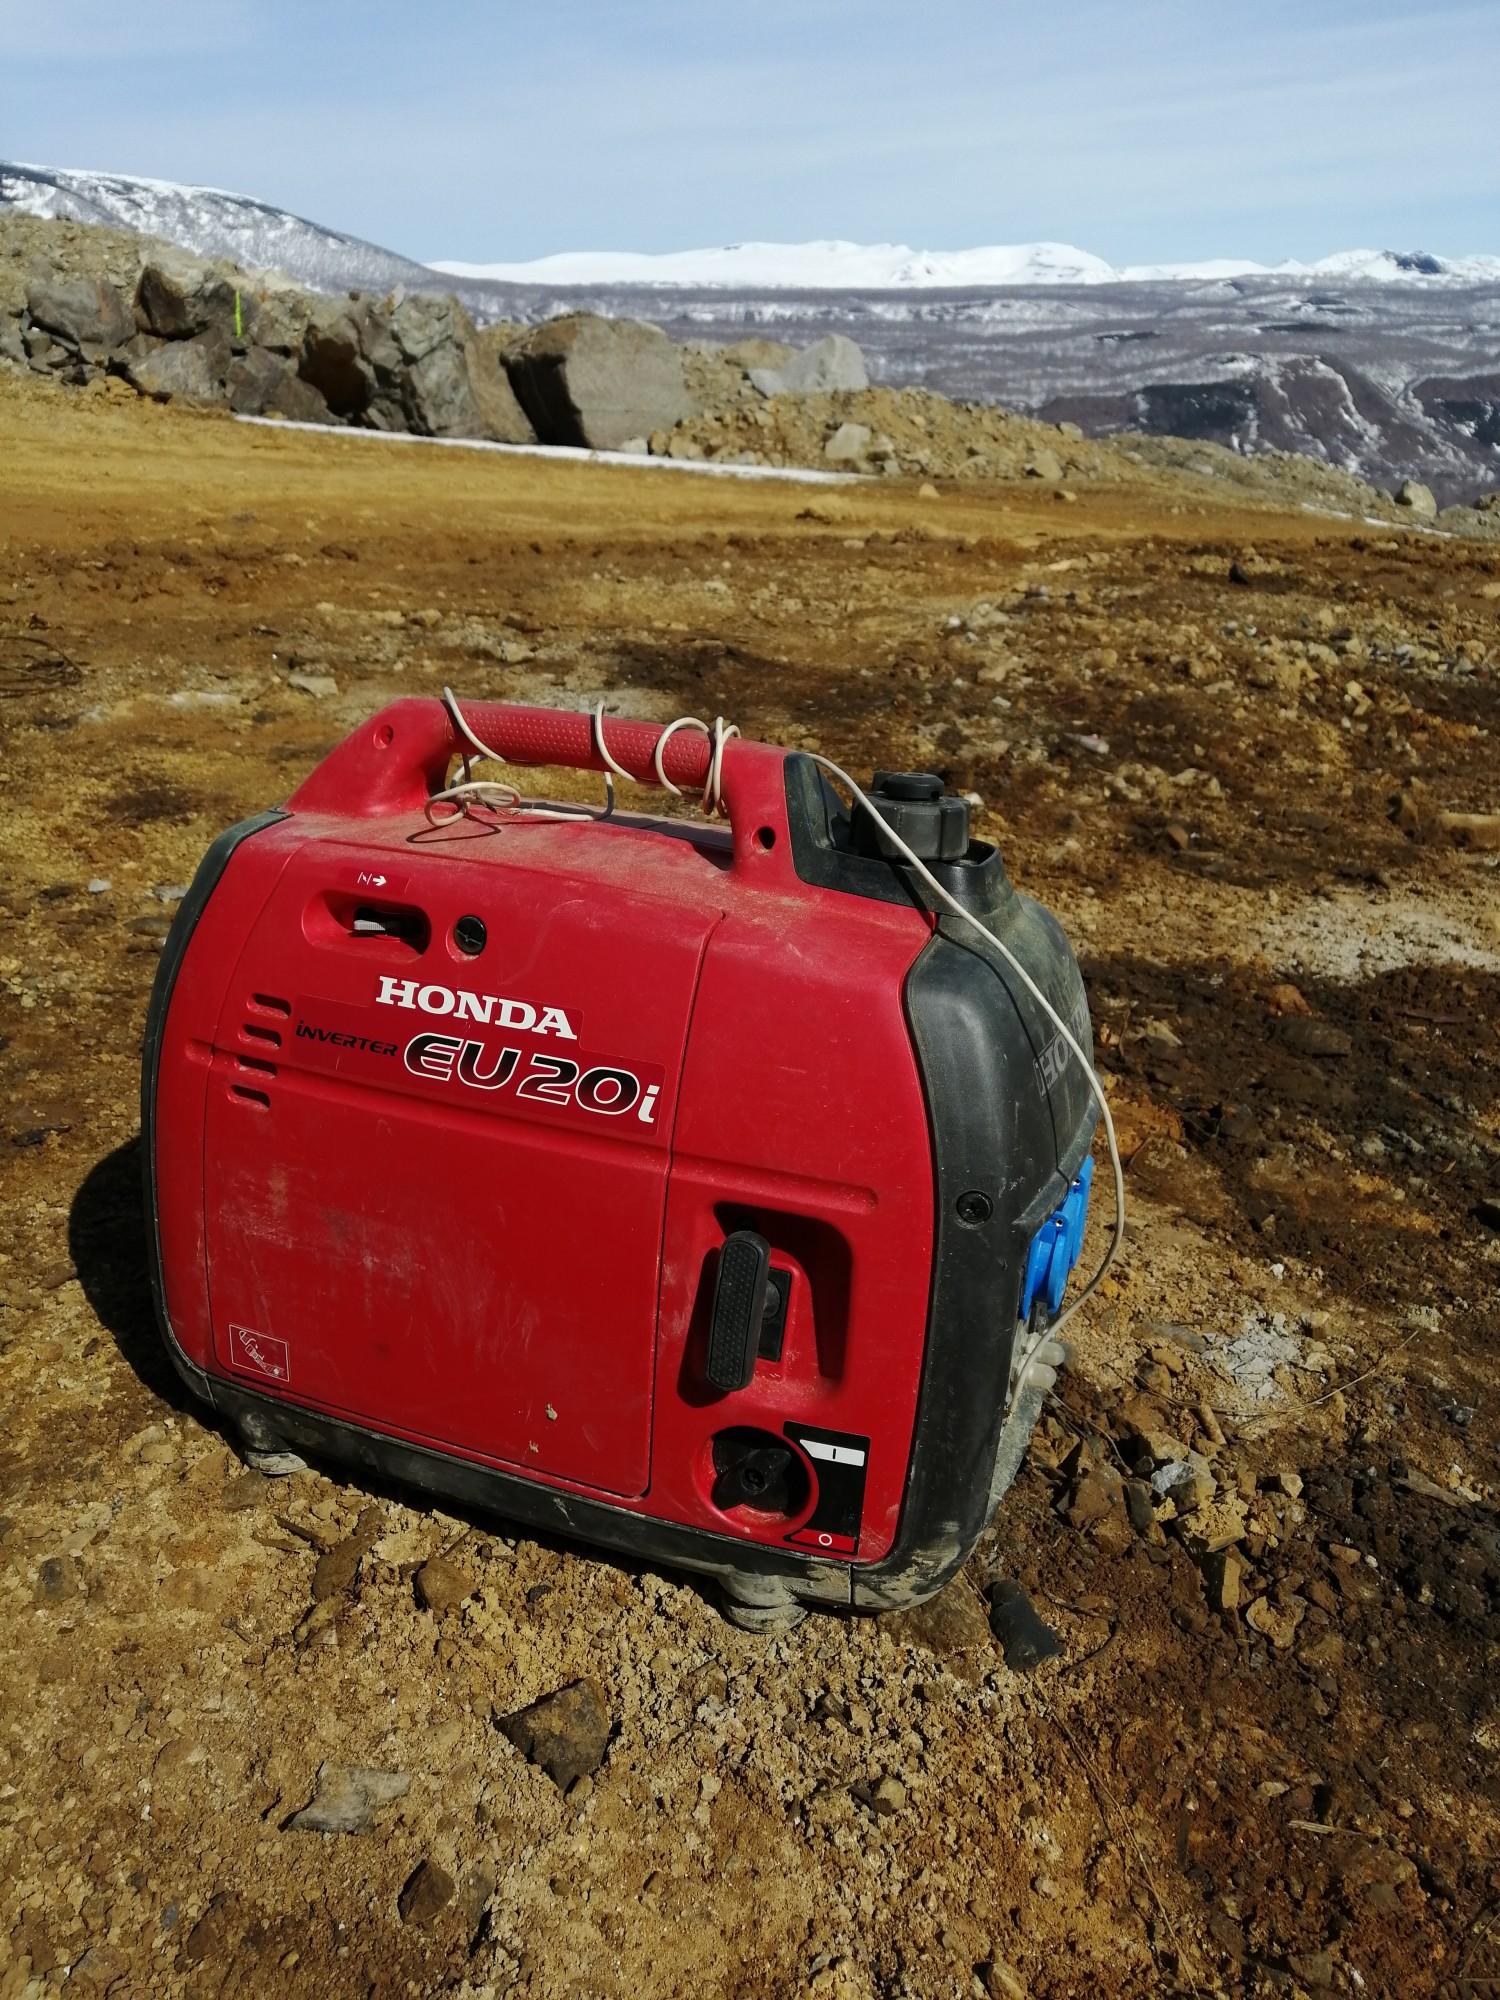 один будний день геофизика на Камчатке, фото 33